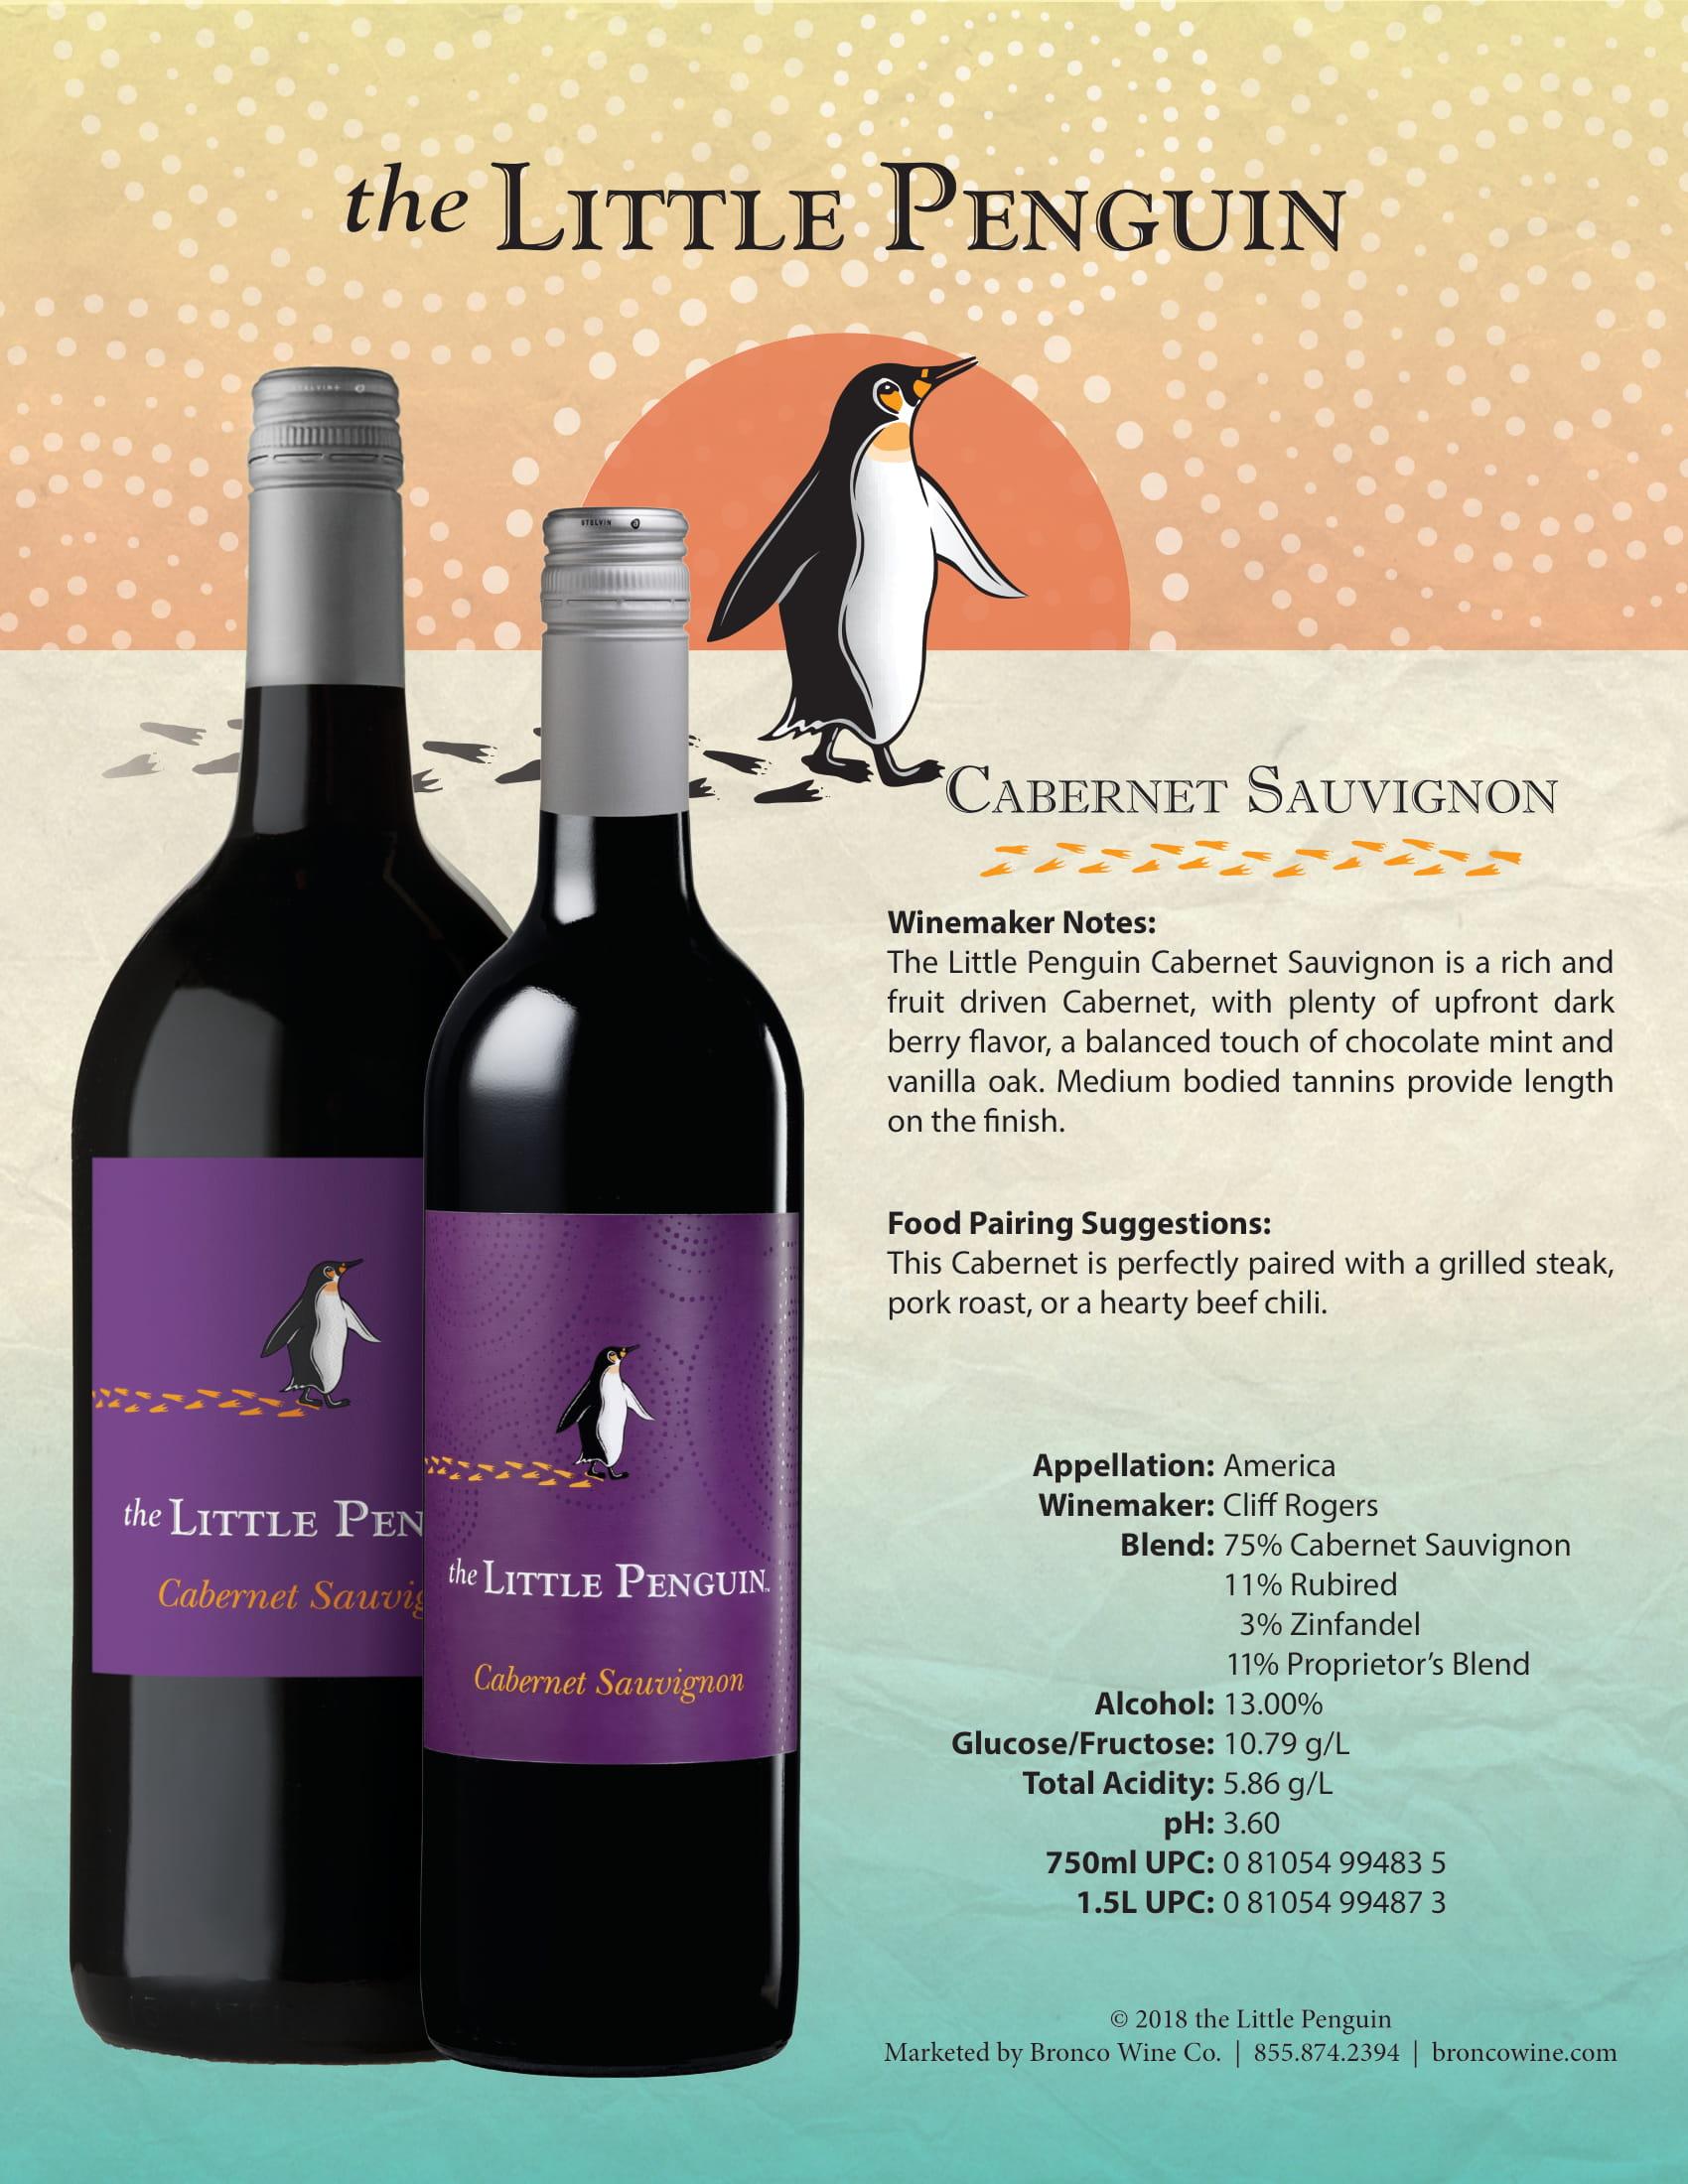 The Little Penguin Cabernet Sauvignon Tech Sheet